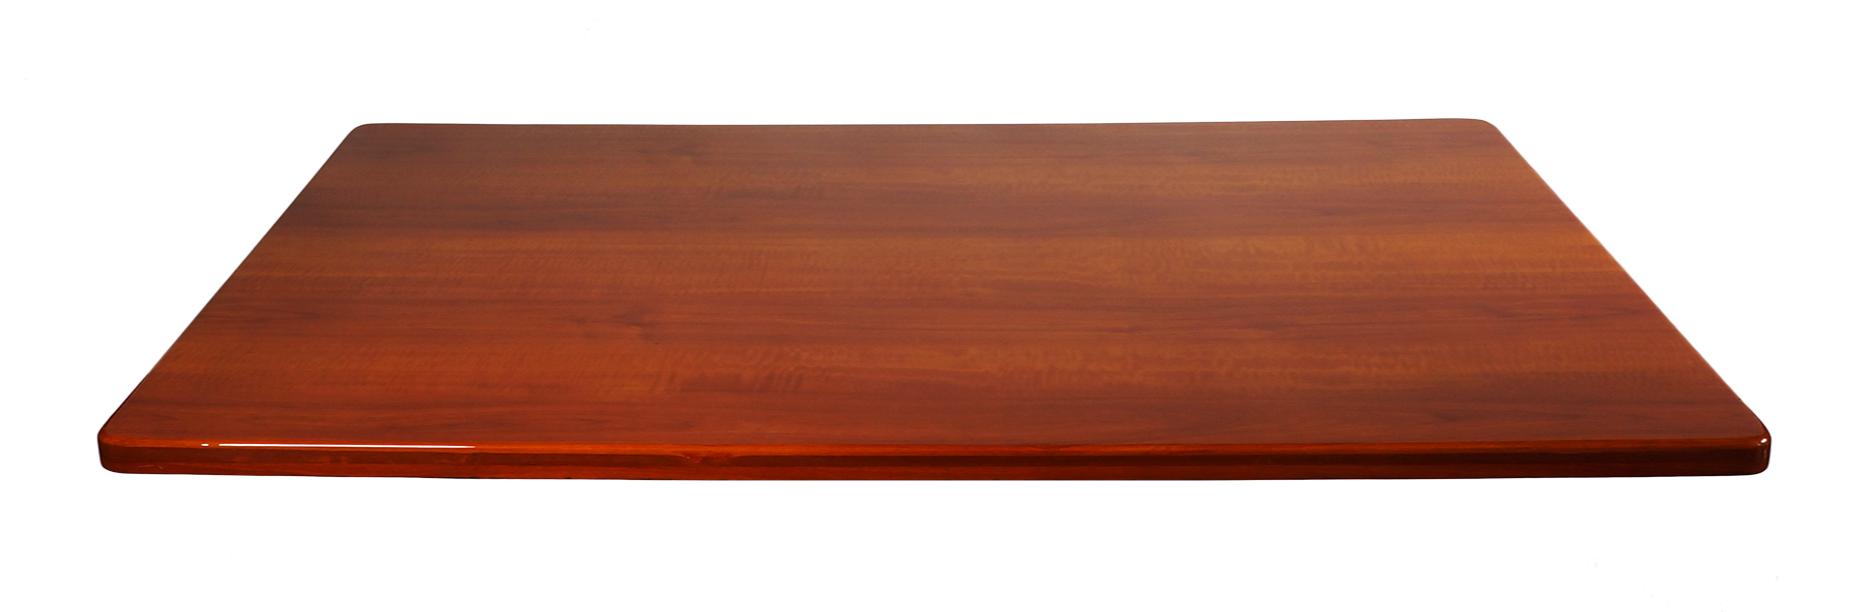 BFM Resin Table Top 30x60 Cherry